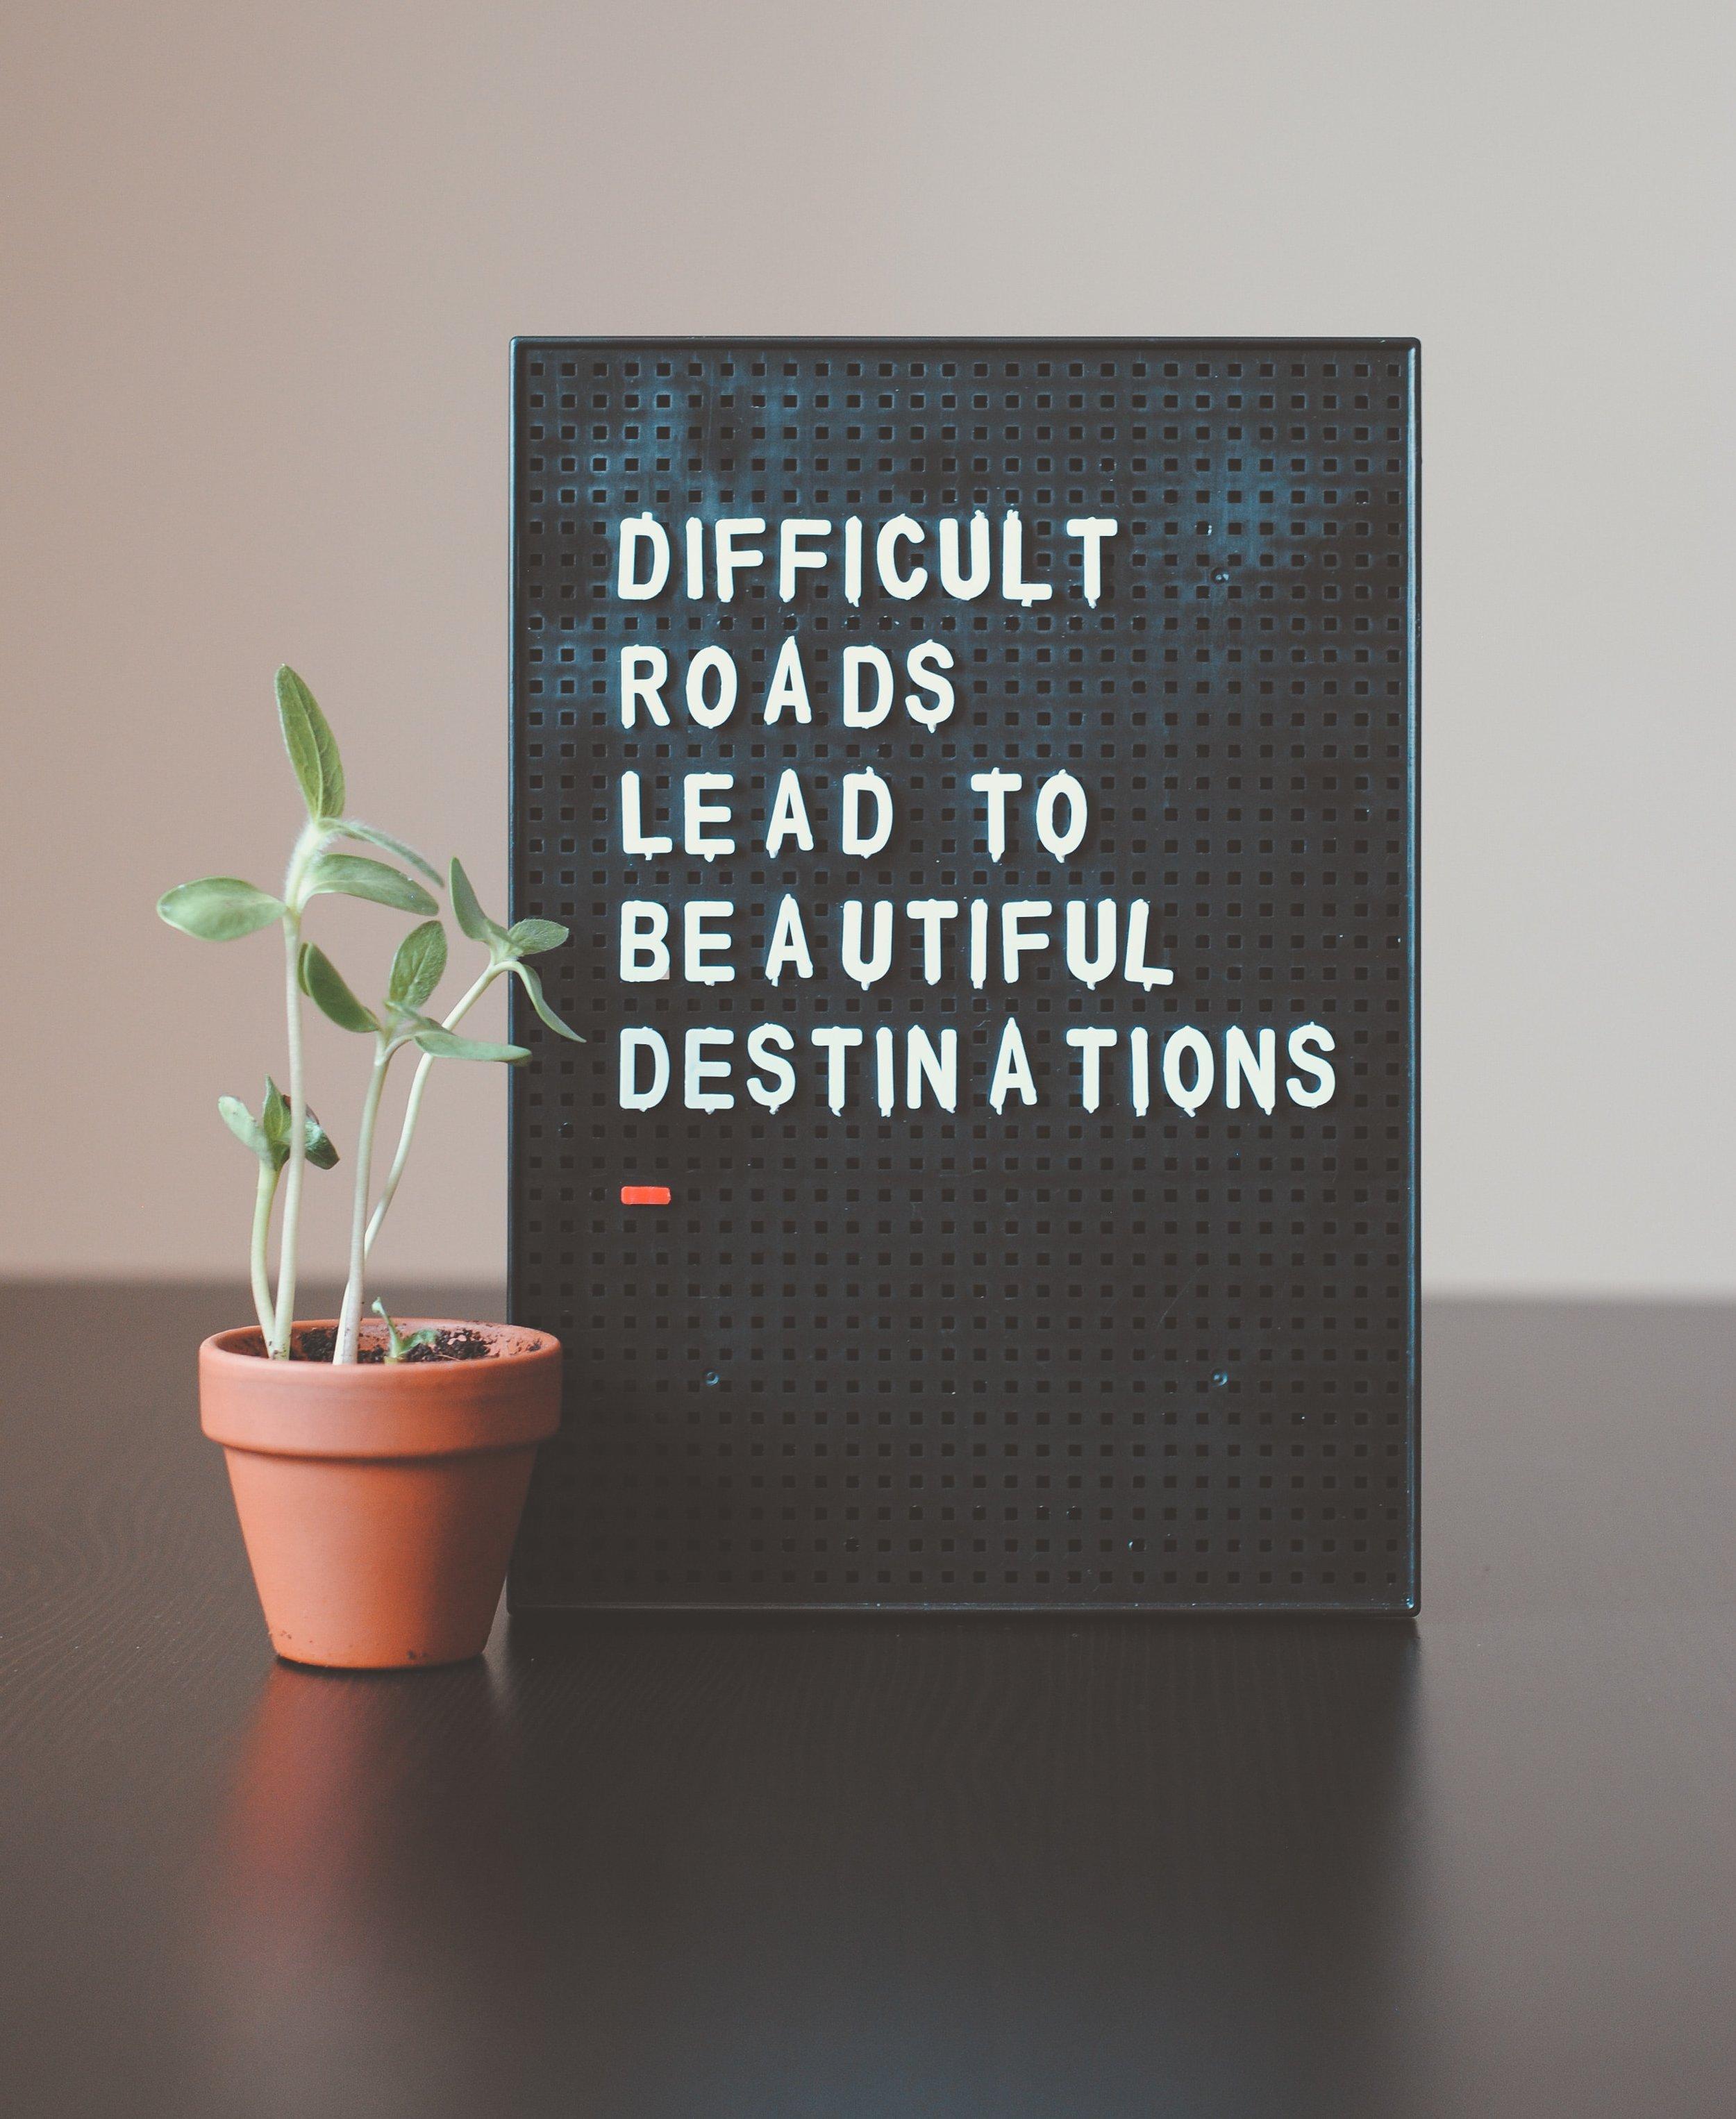 DifficultRoadsLeadToBeautifulDestinations